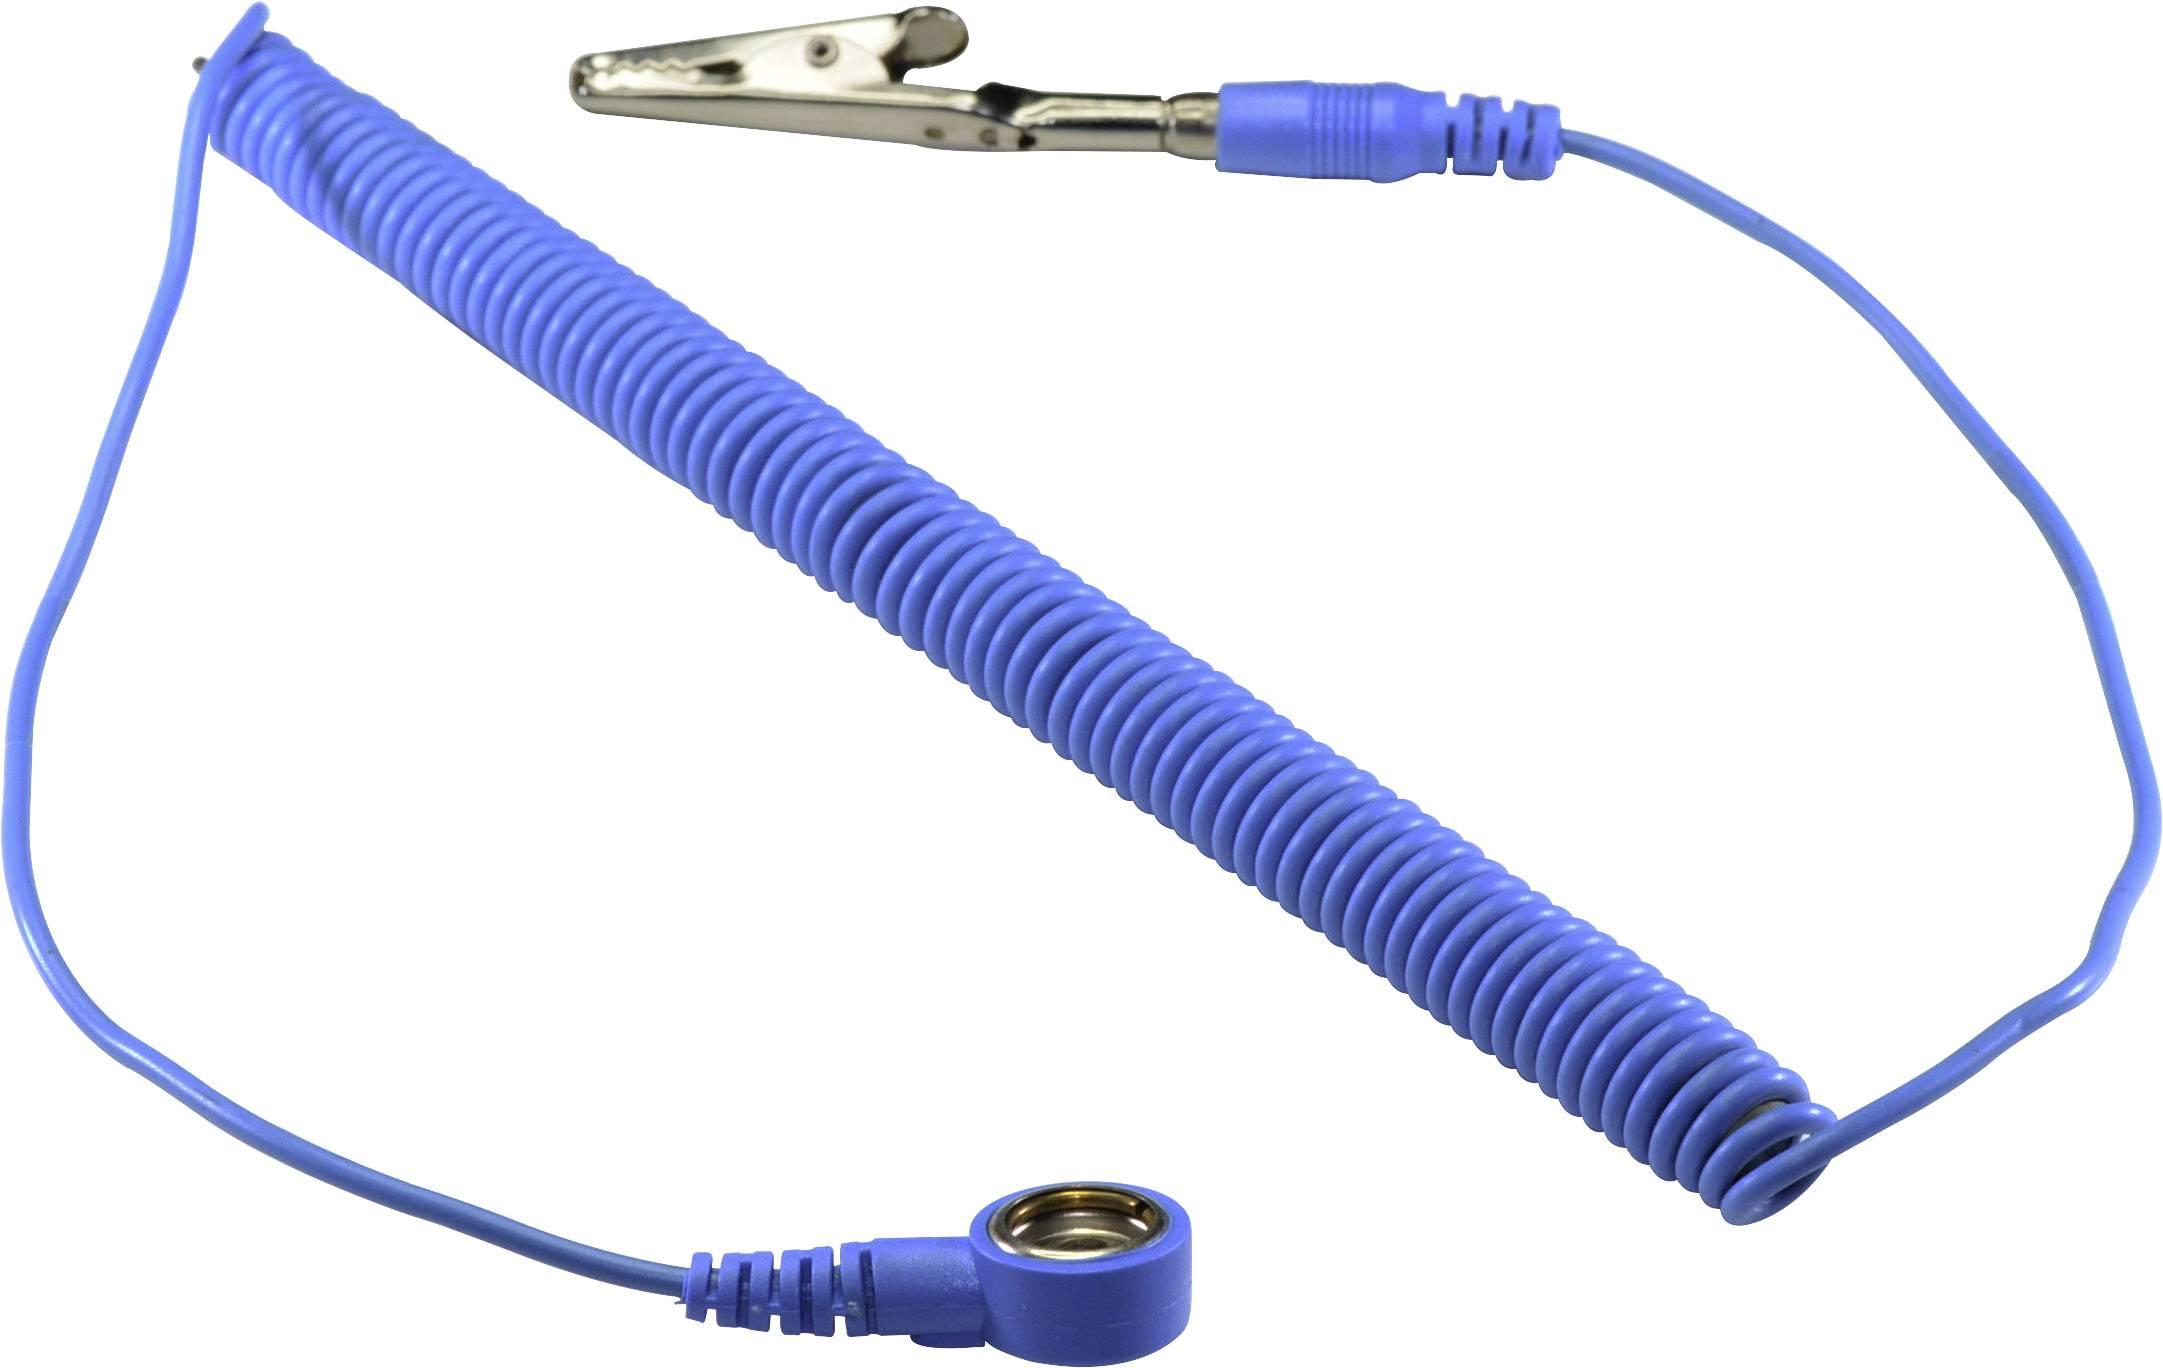 ESD uzemňovací kábel Conrad Components SpKL-10-244-SK, 2.44 m